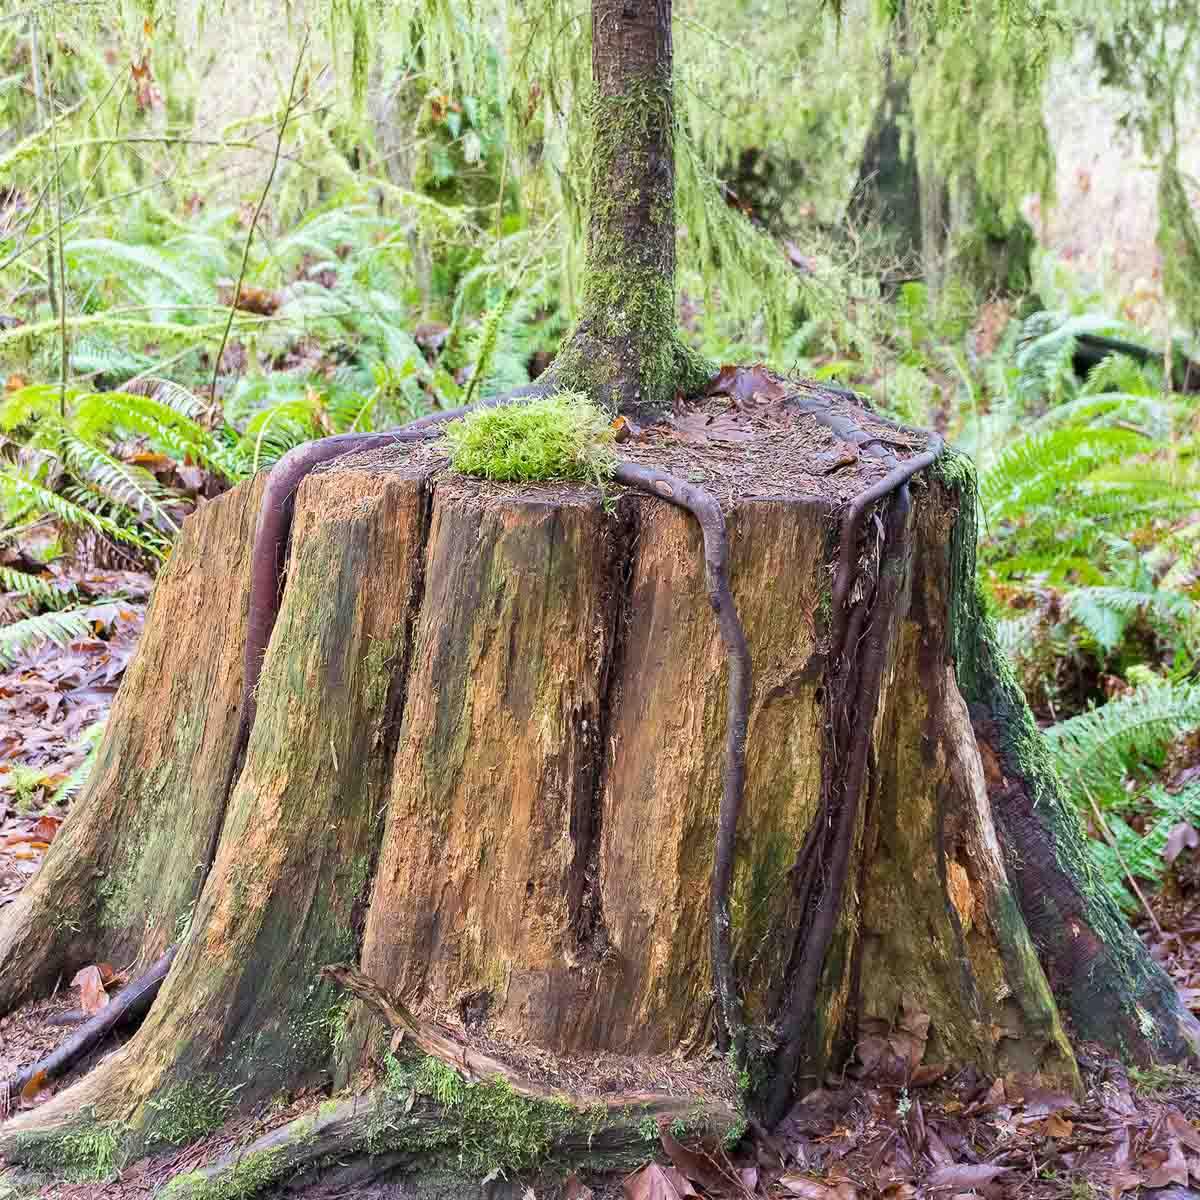 western hemlock growing on western redcedar stump